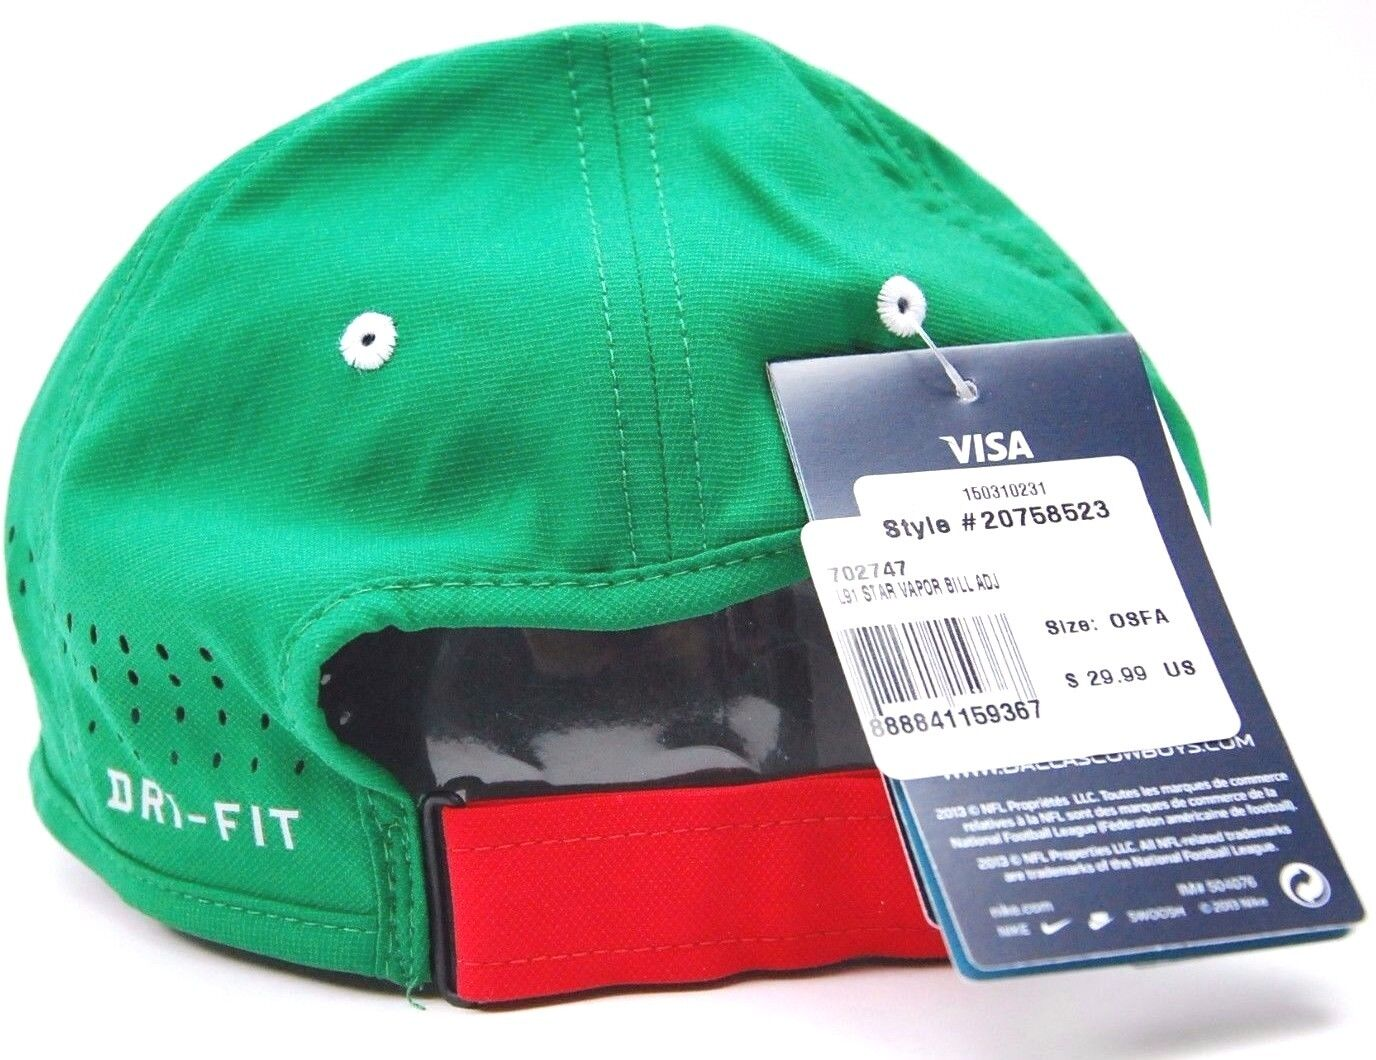 Licensed Dallas Cowboys Nike L91 Star Vapor Dri-fit Mexico Colors Hat B105  for sale online  810cd73bc